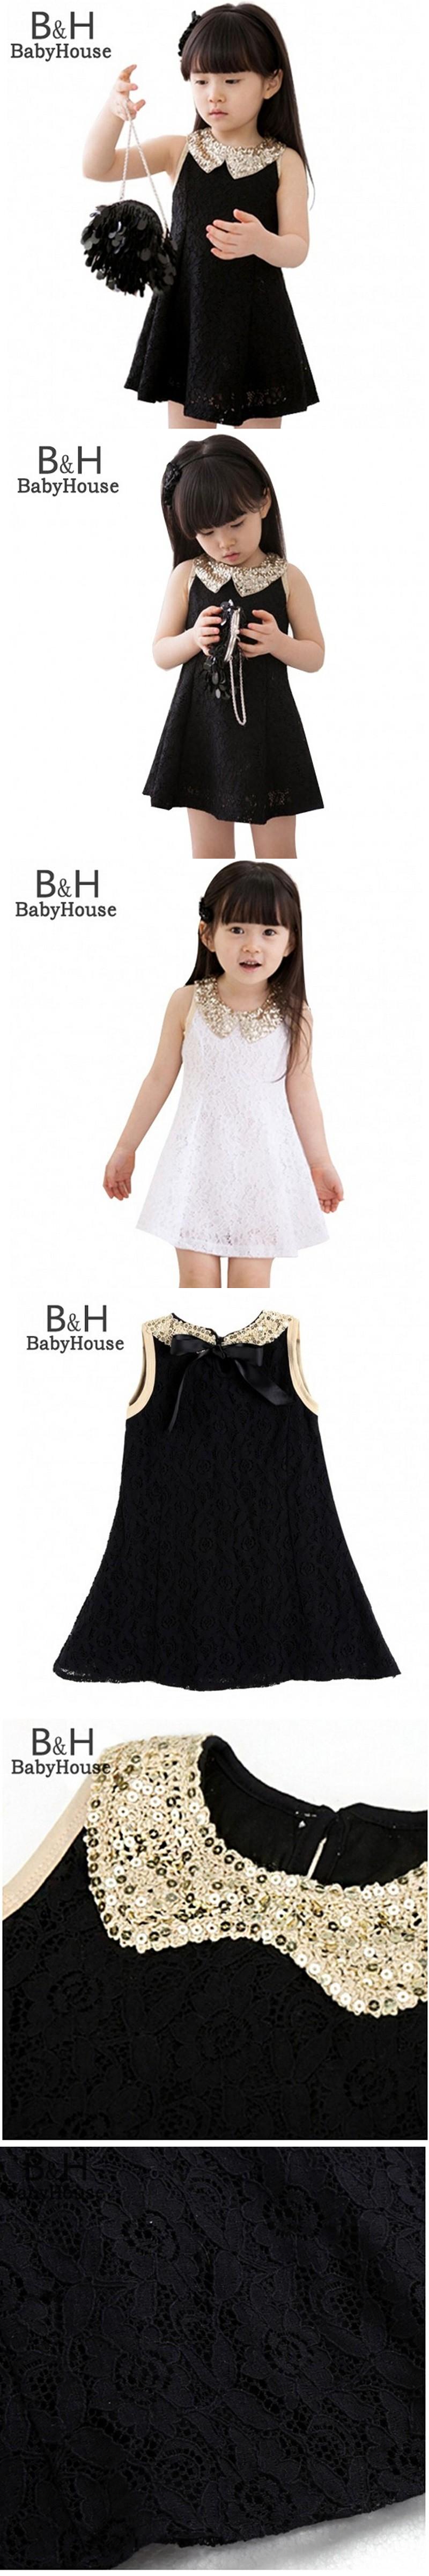 New fashion girls clothes tutu dress kids clothing princess